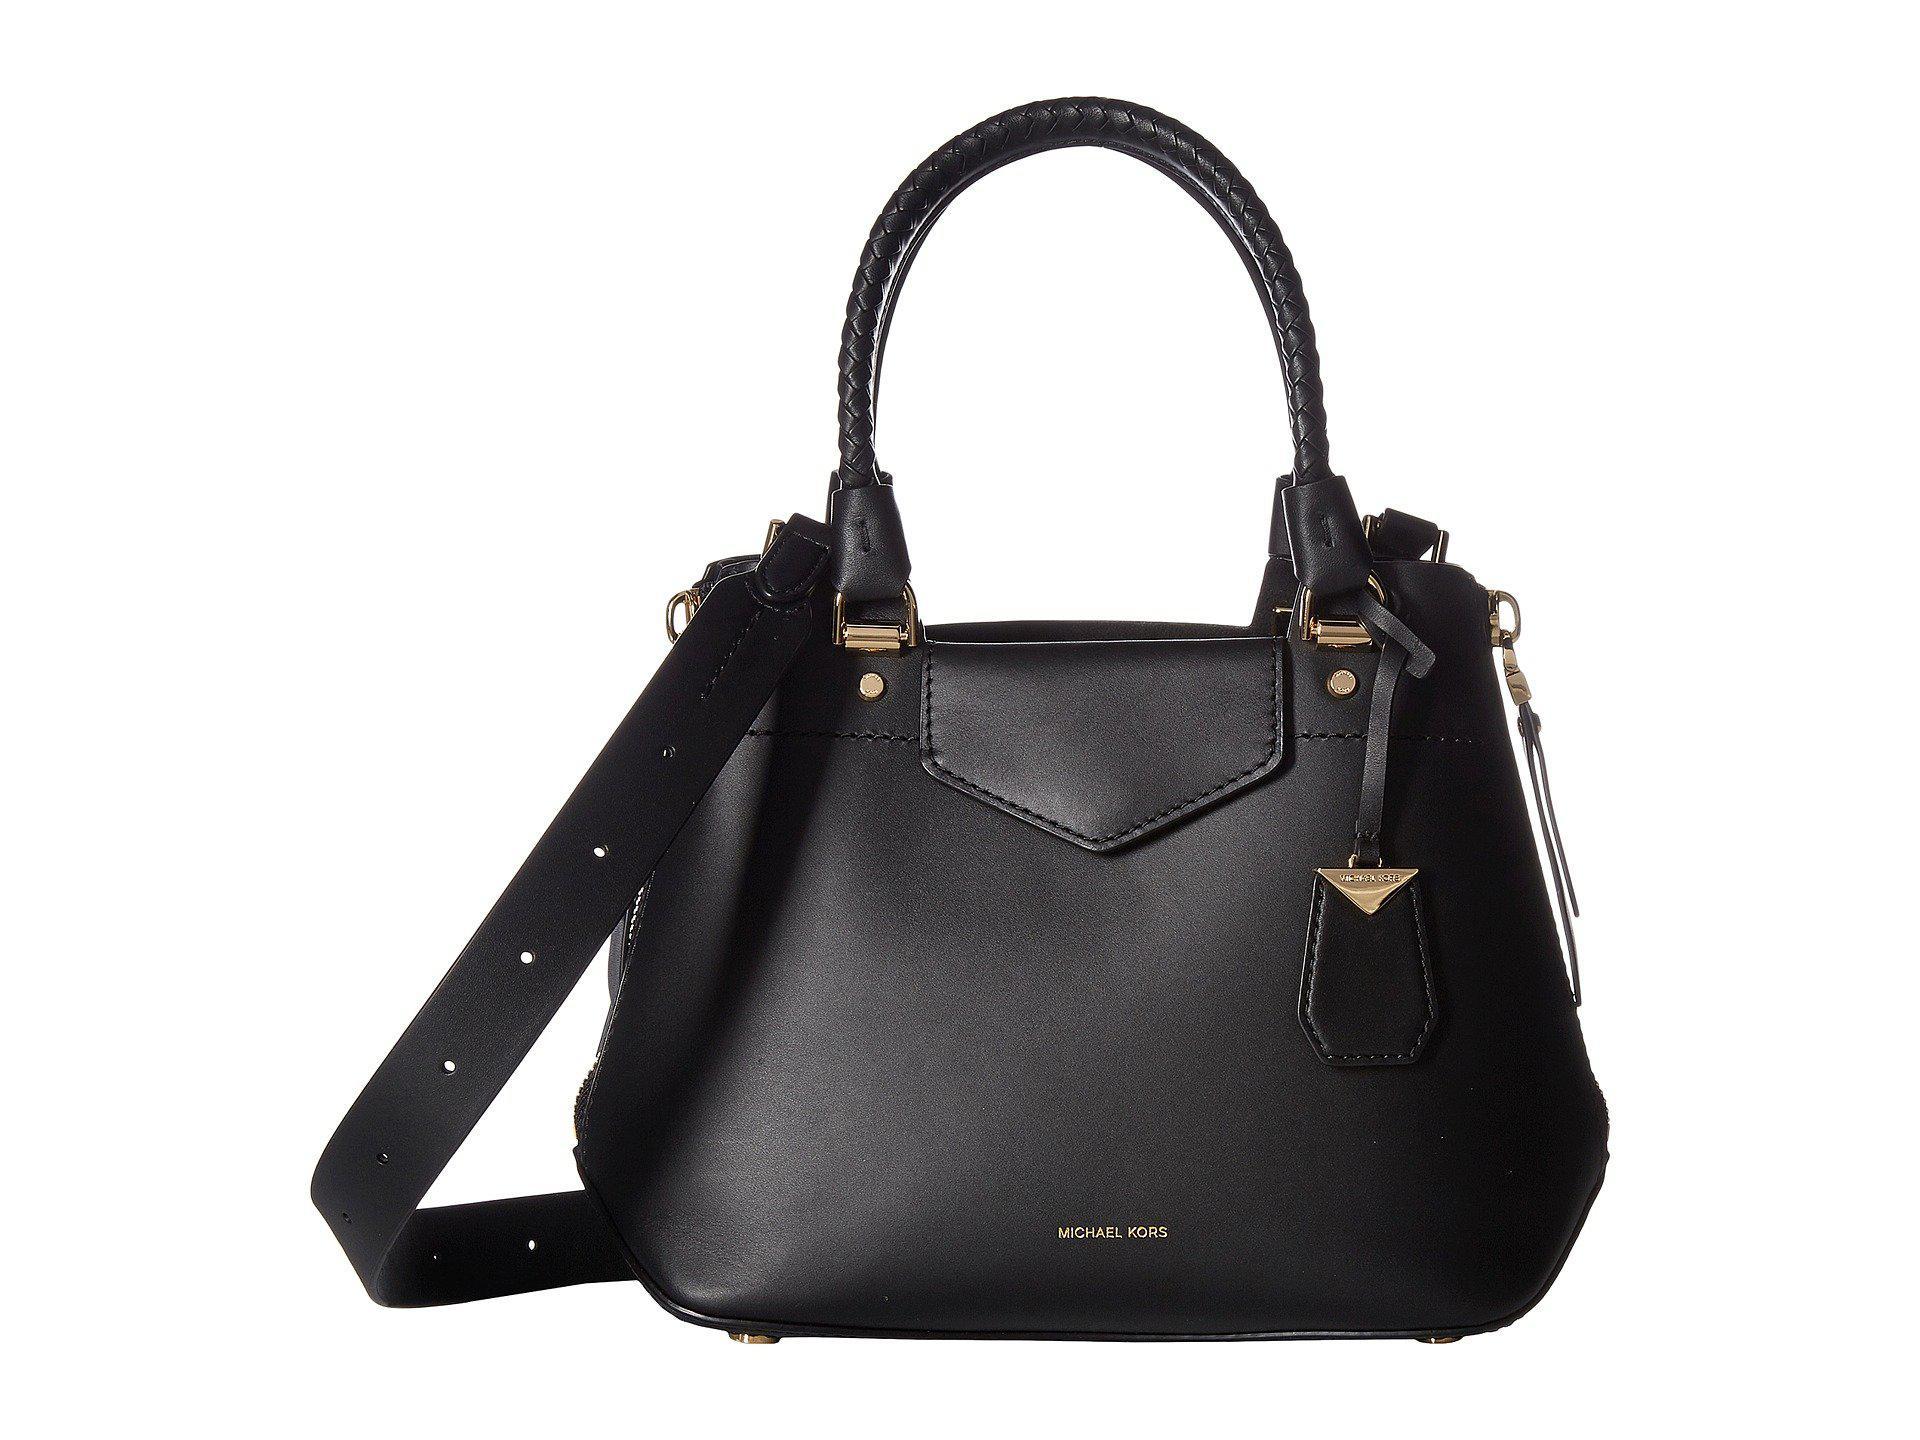 Blakely Medium Messenger Bag in Black Viola Leather Michael Michael Kors M7d3oh